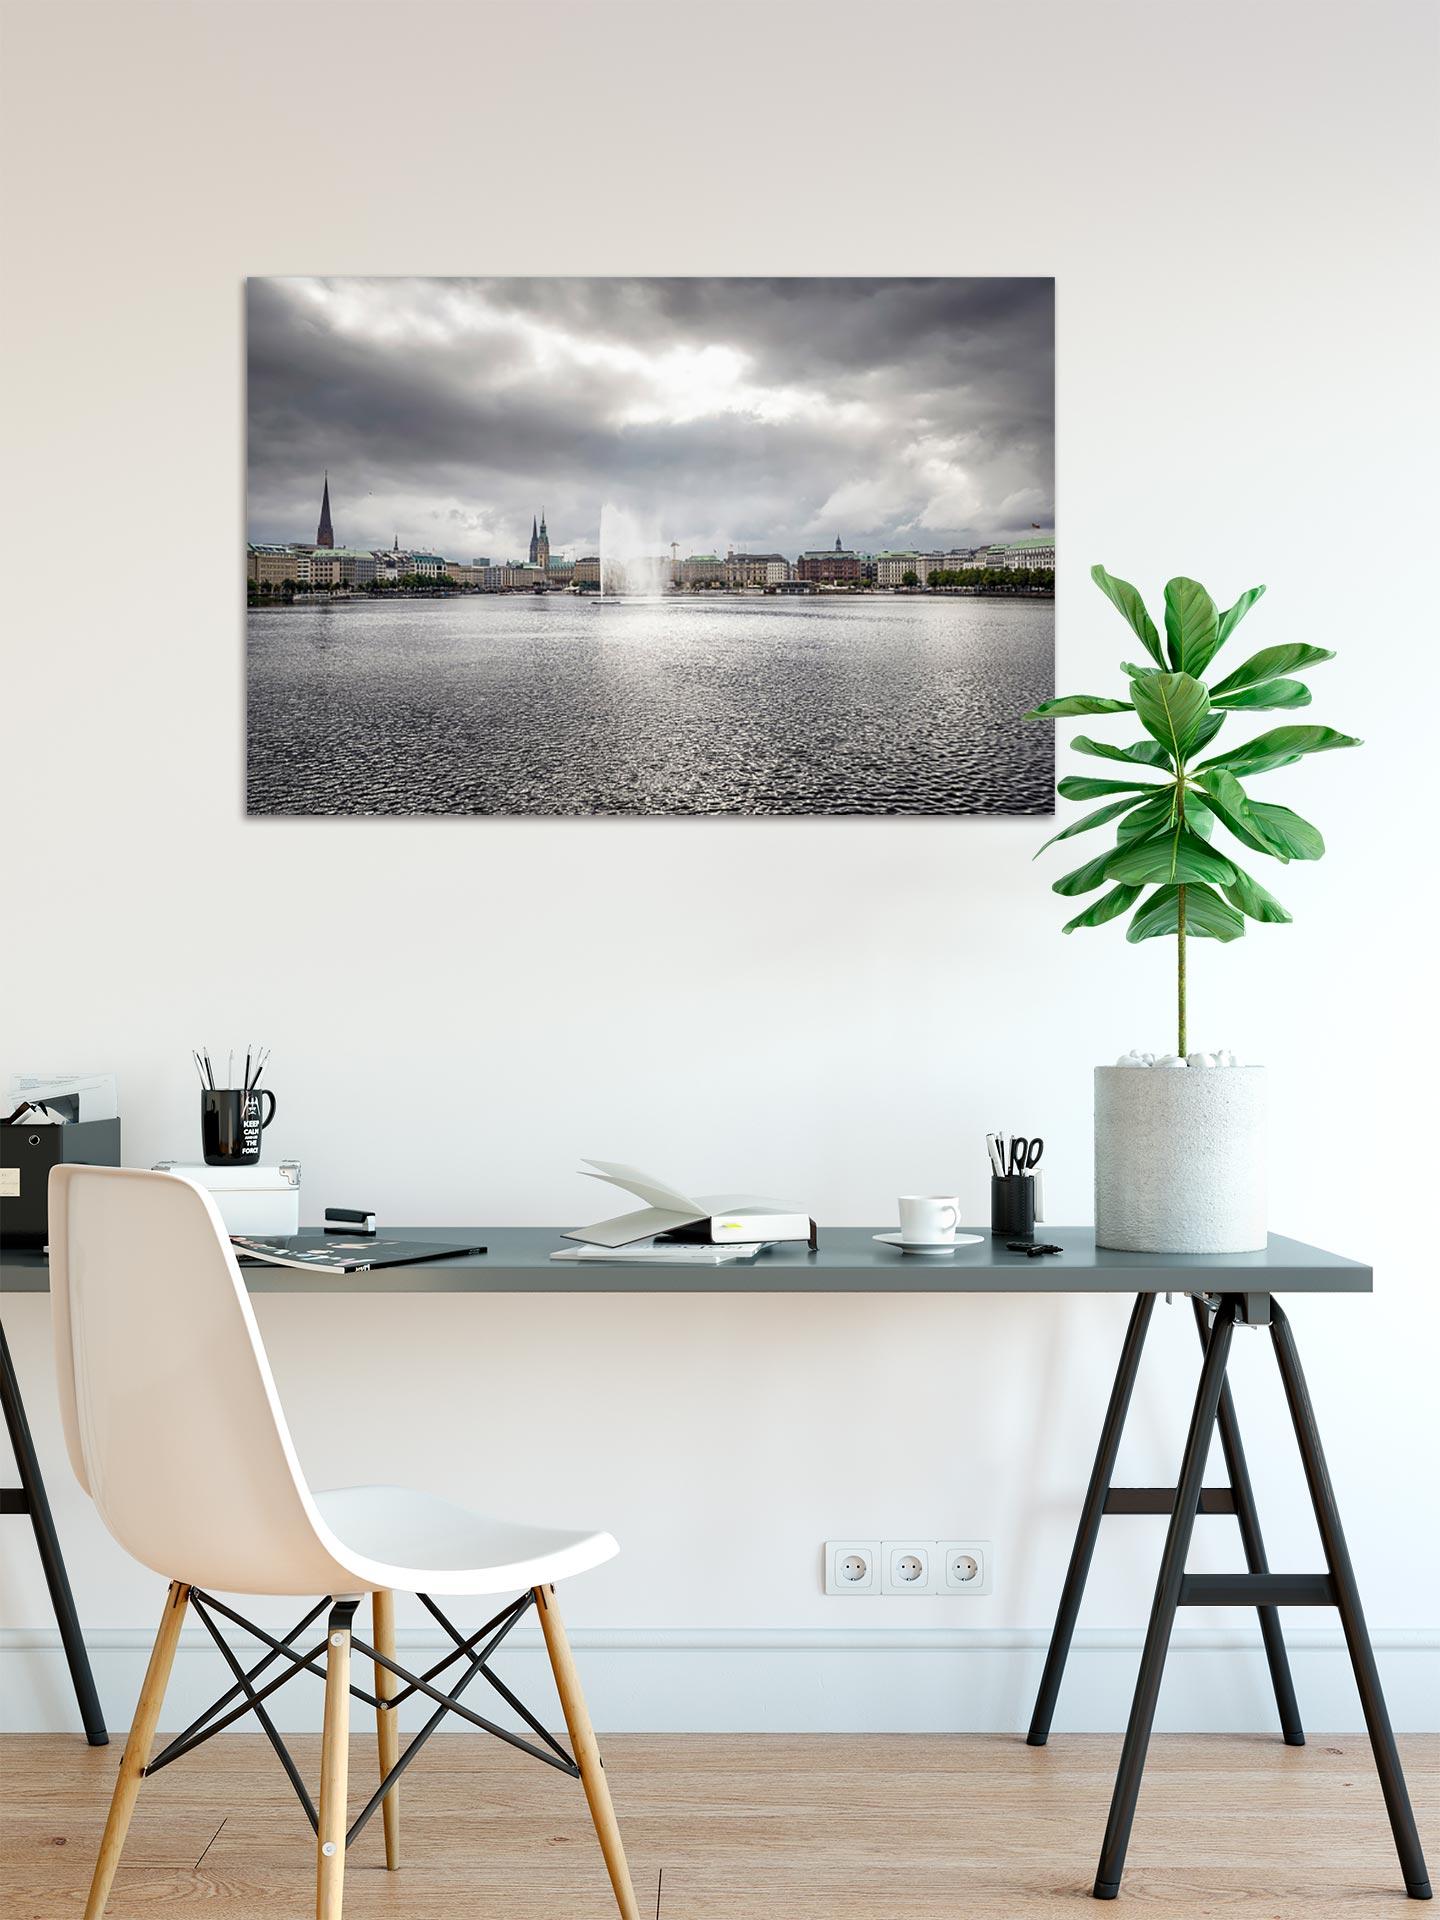 TG616-silbrige-alster-wandbild-bild-auf-leinwand-acrylglas-aludibond-arbeitszimmer